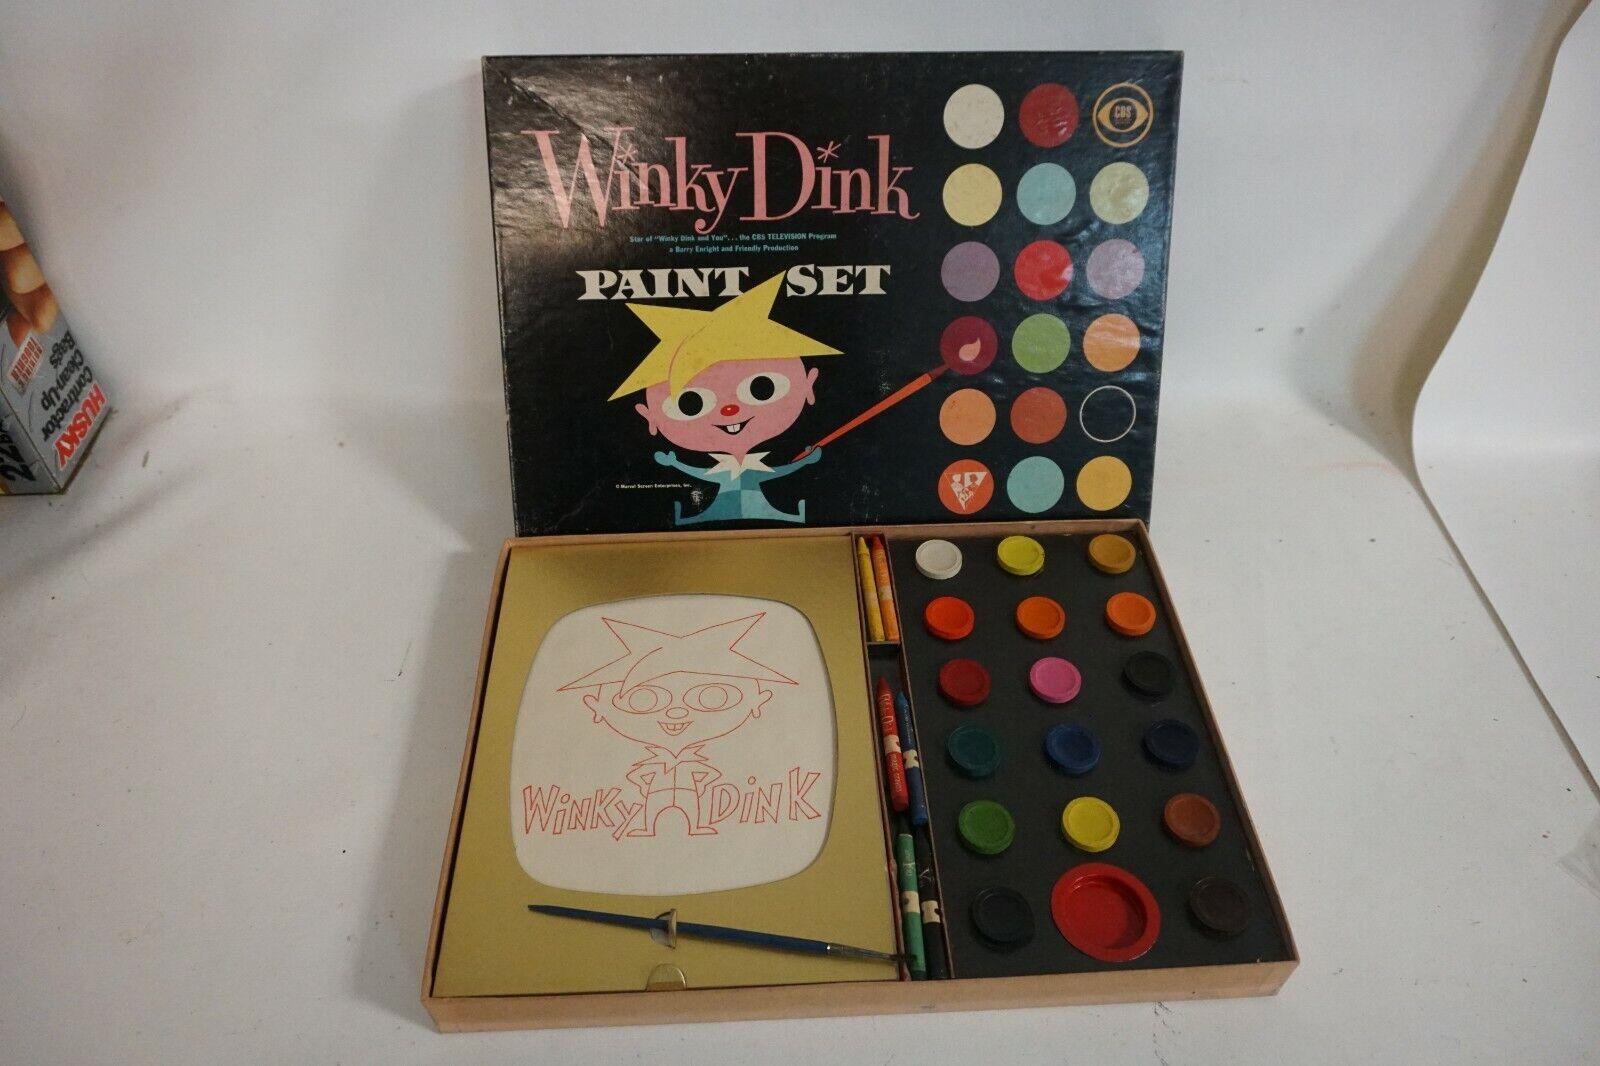 vendendo bene in tutto il mondo 1950s 1950s 1950s Vintage Winky Dink e You Paint Set giocattolokraft CBS TV MIB  AF75  per offrirti un piacevole shopping online